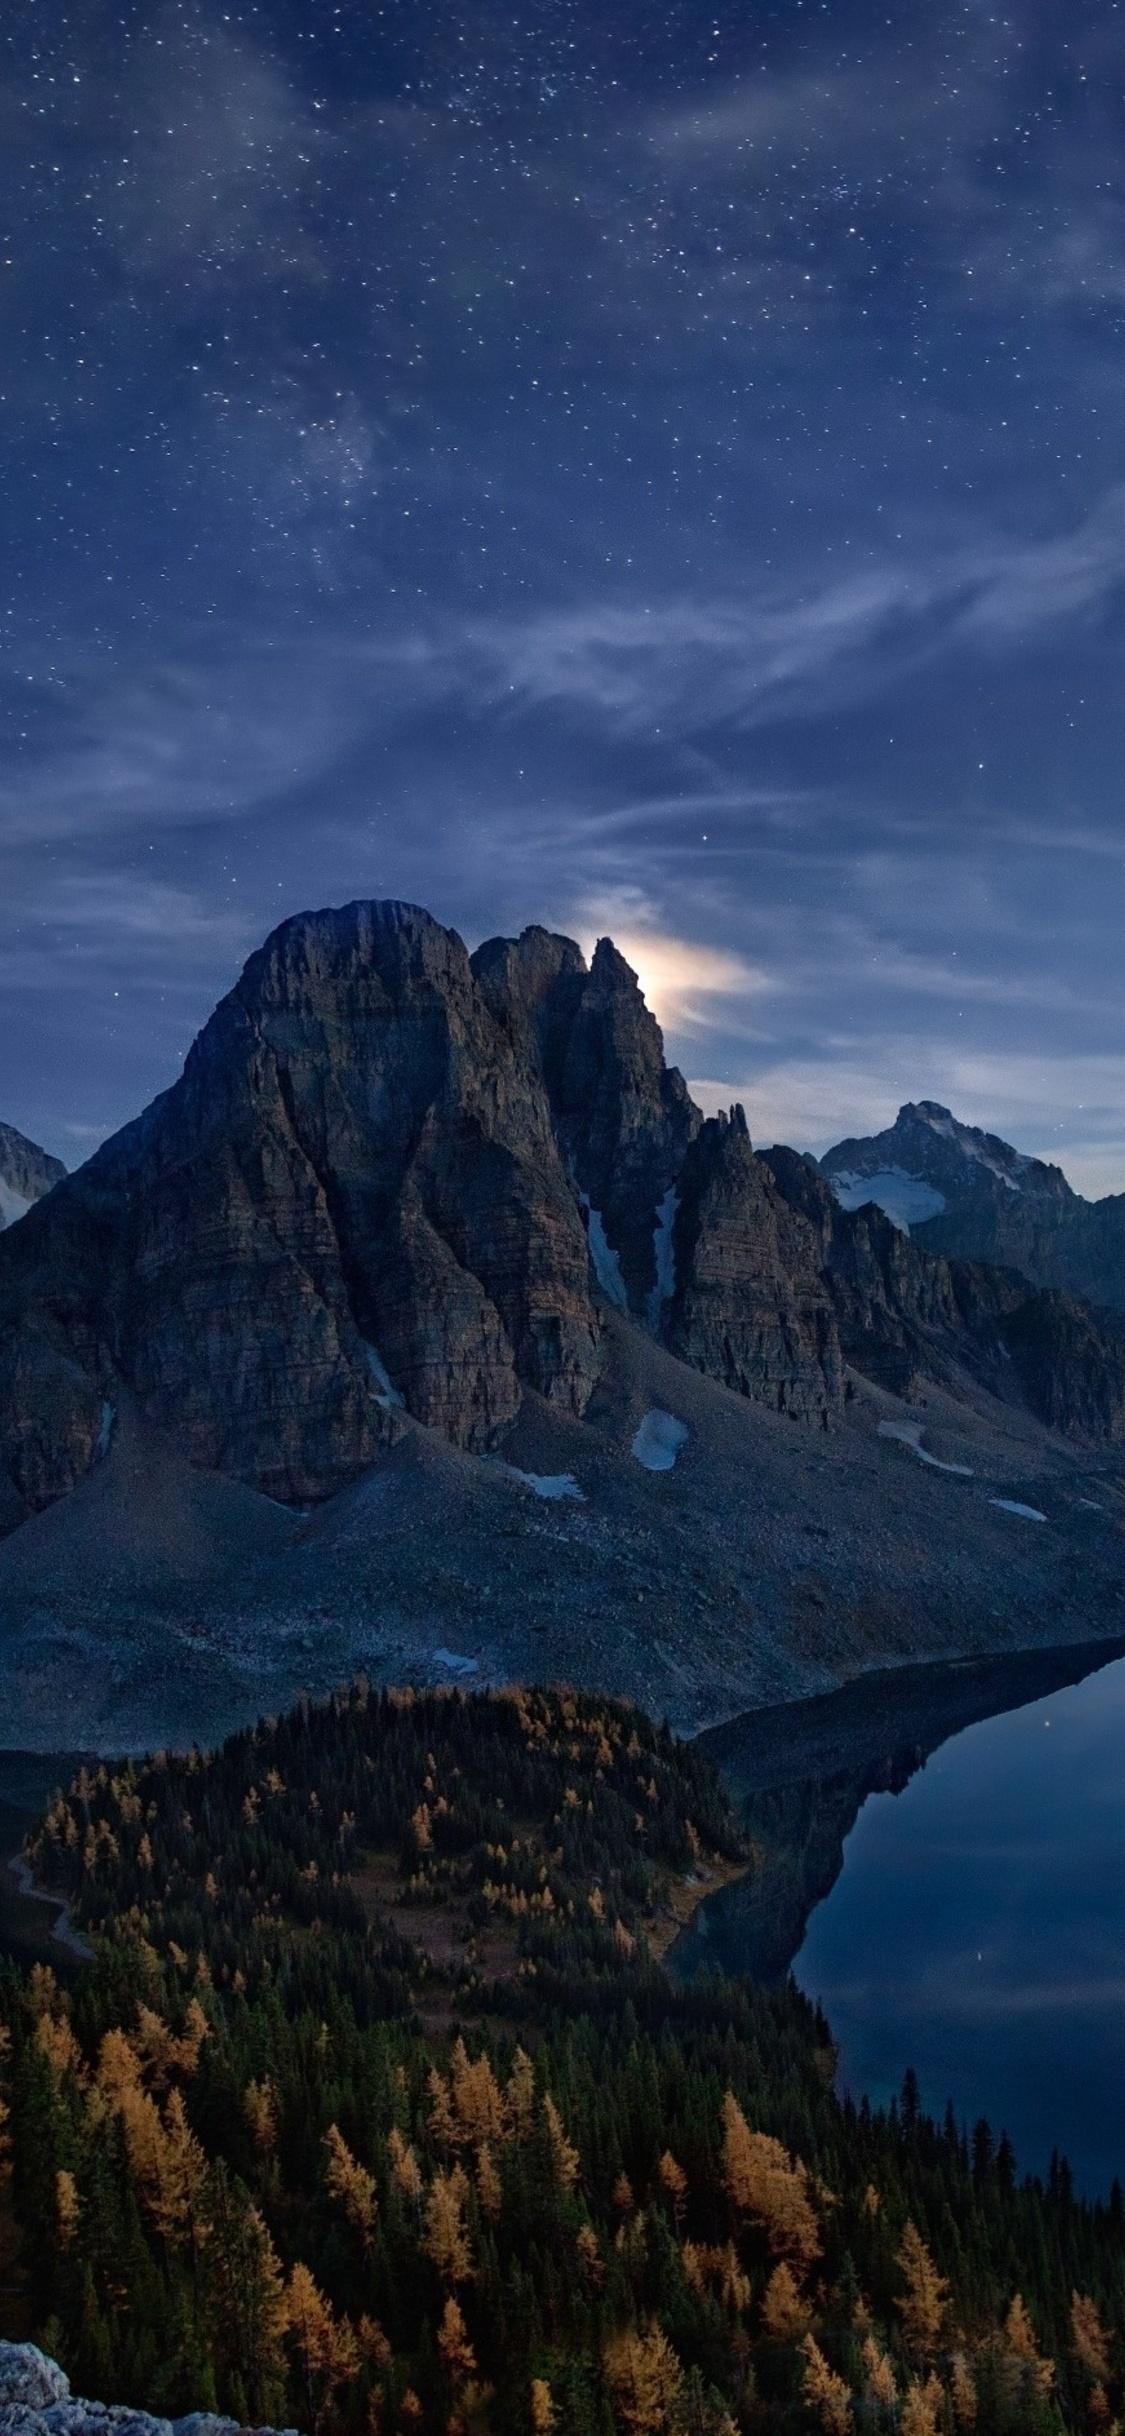 1125x2436 Snowy Peak Starry Night Landscape Iphone Xs Iphone